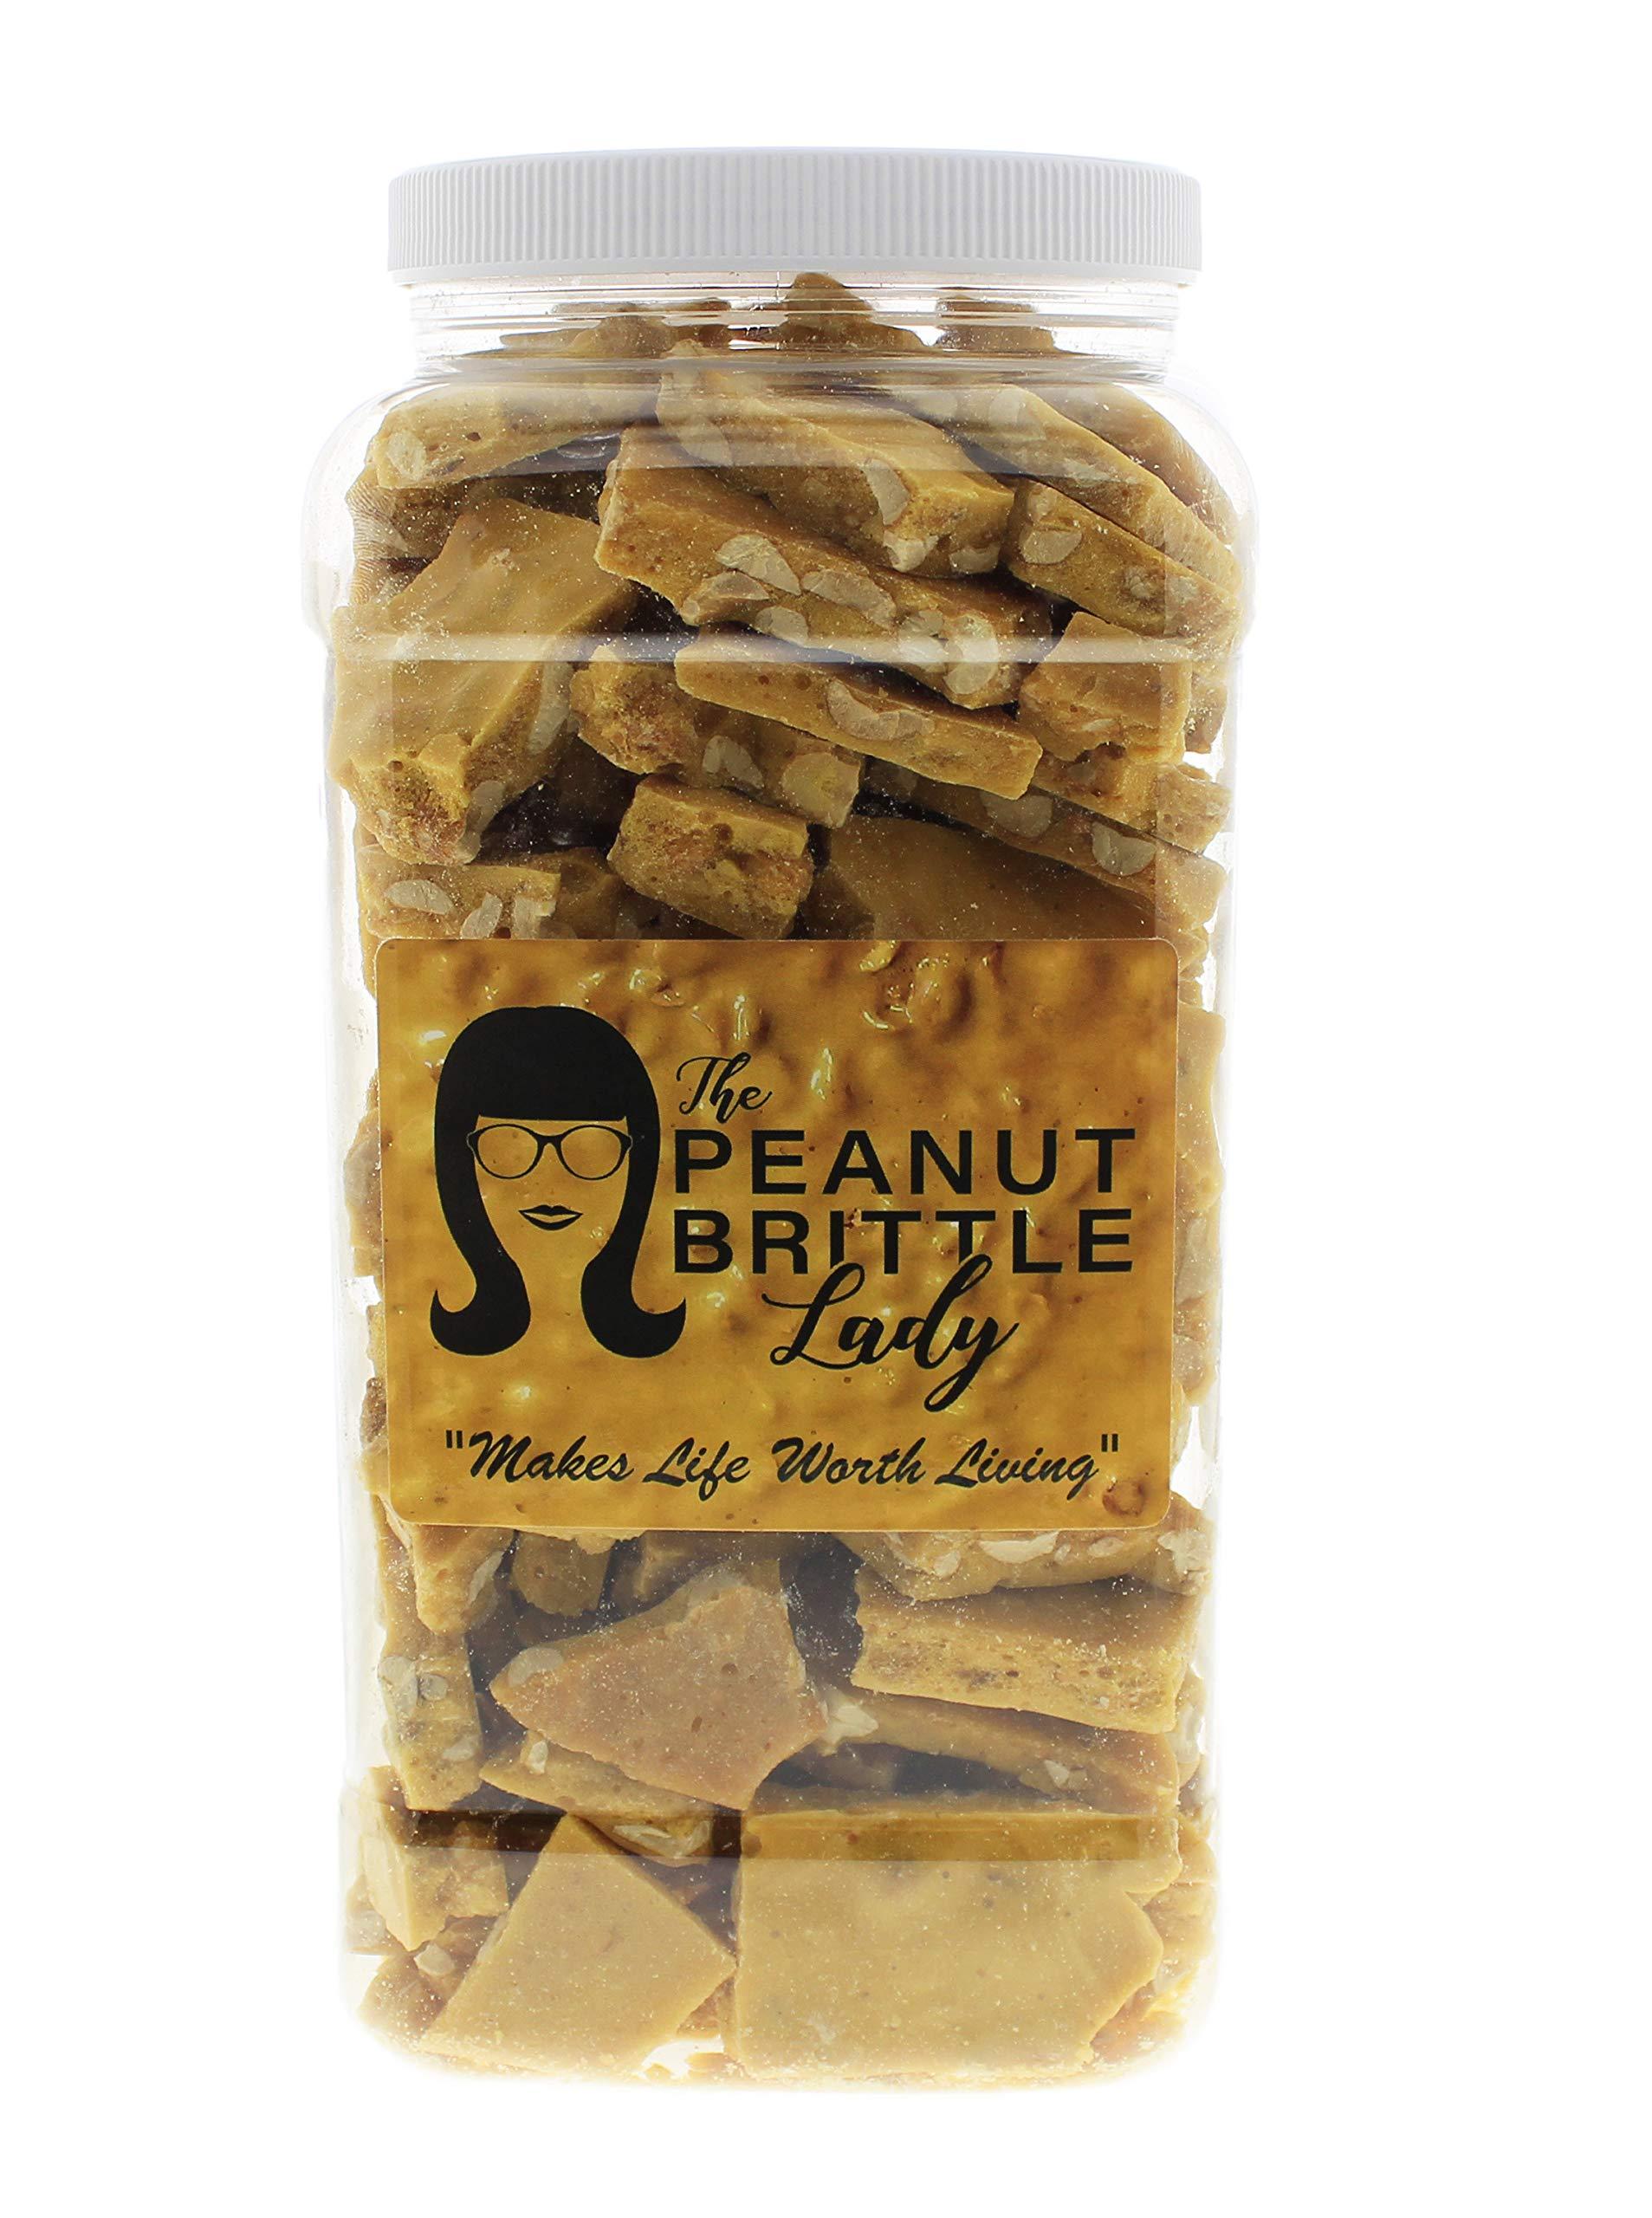 Top Shelf Handmade Gourmet Peanut Brittle Candy, Small Batch, Homemade; Size: OMG! (Oh My Gallon)